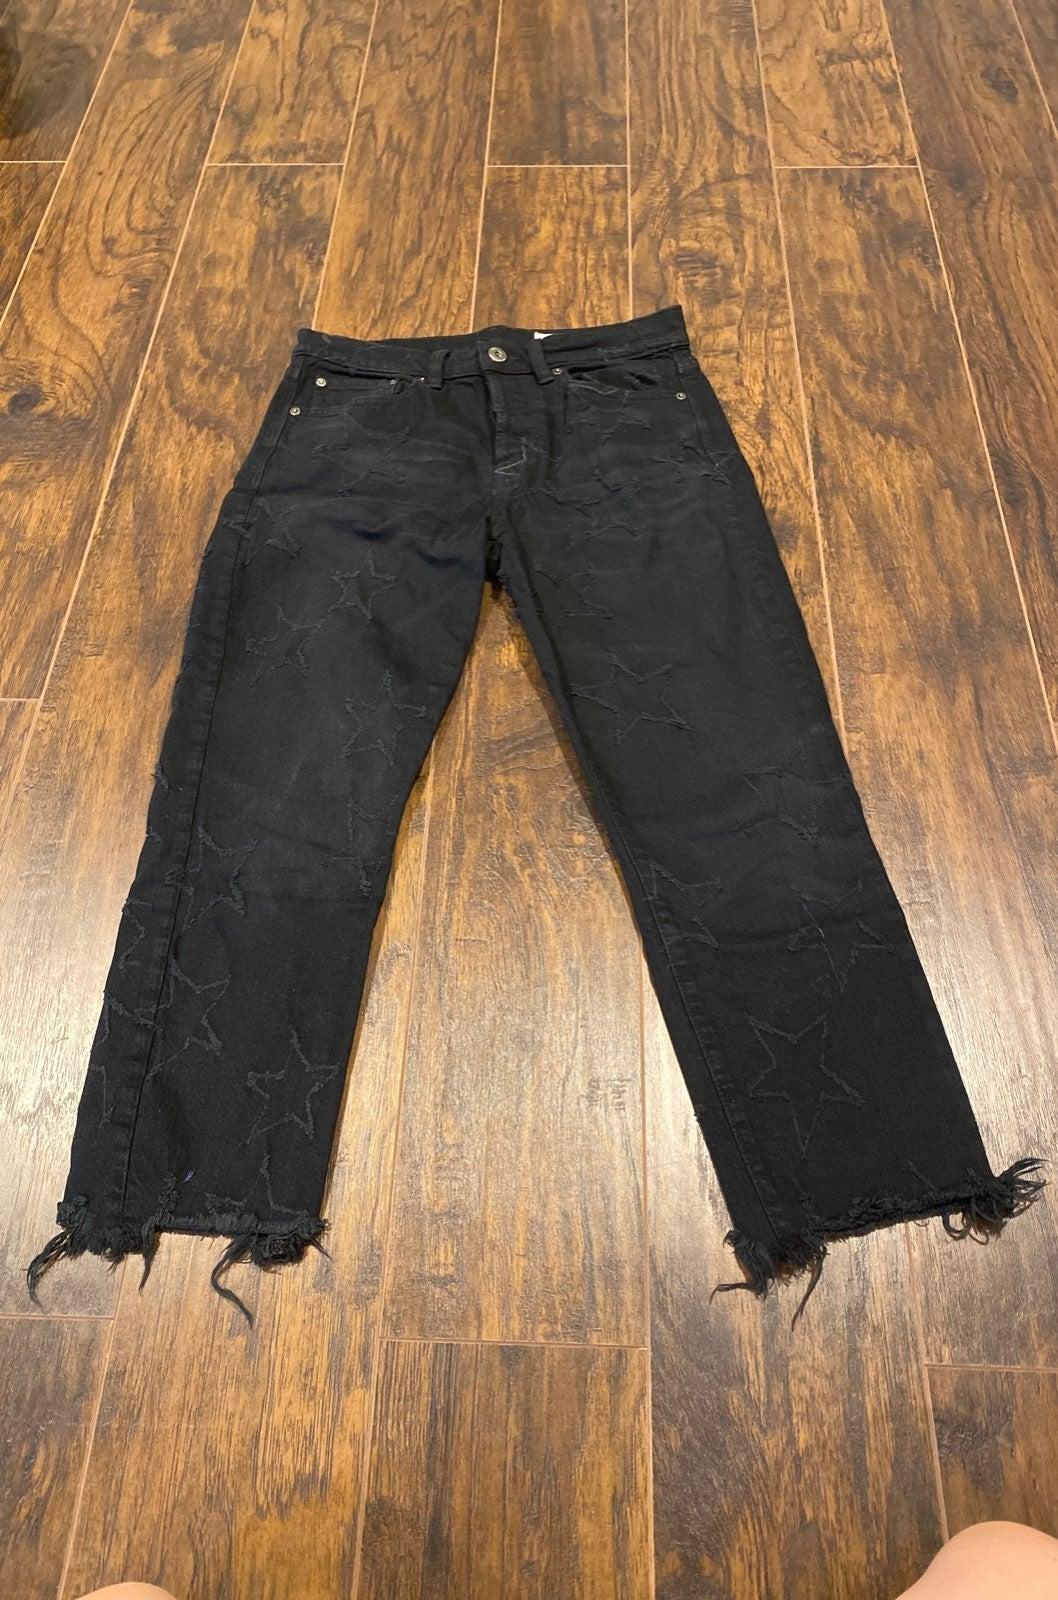 Womens pistola jeans size 28